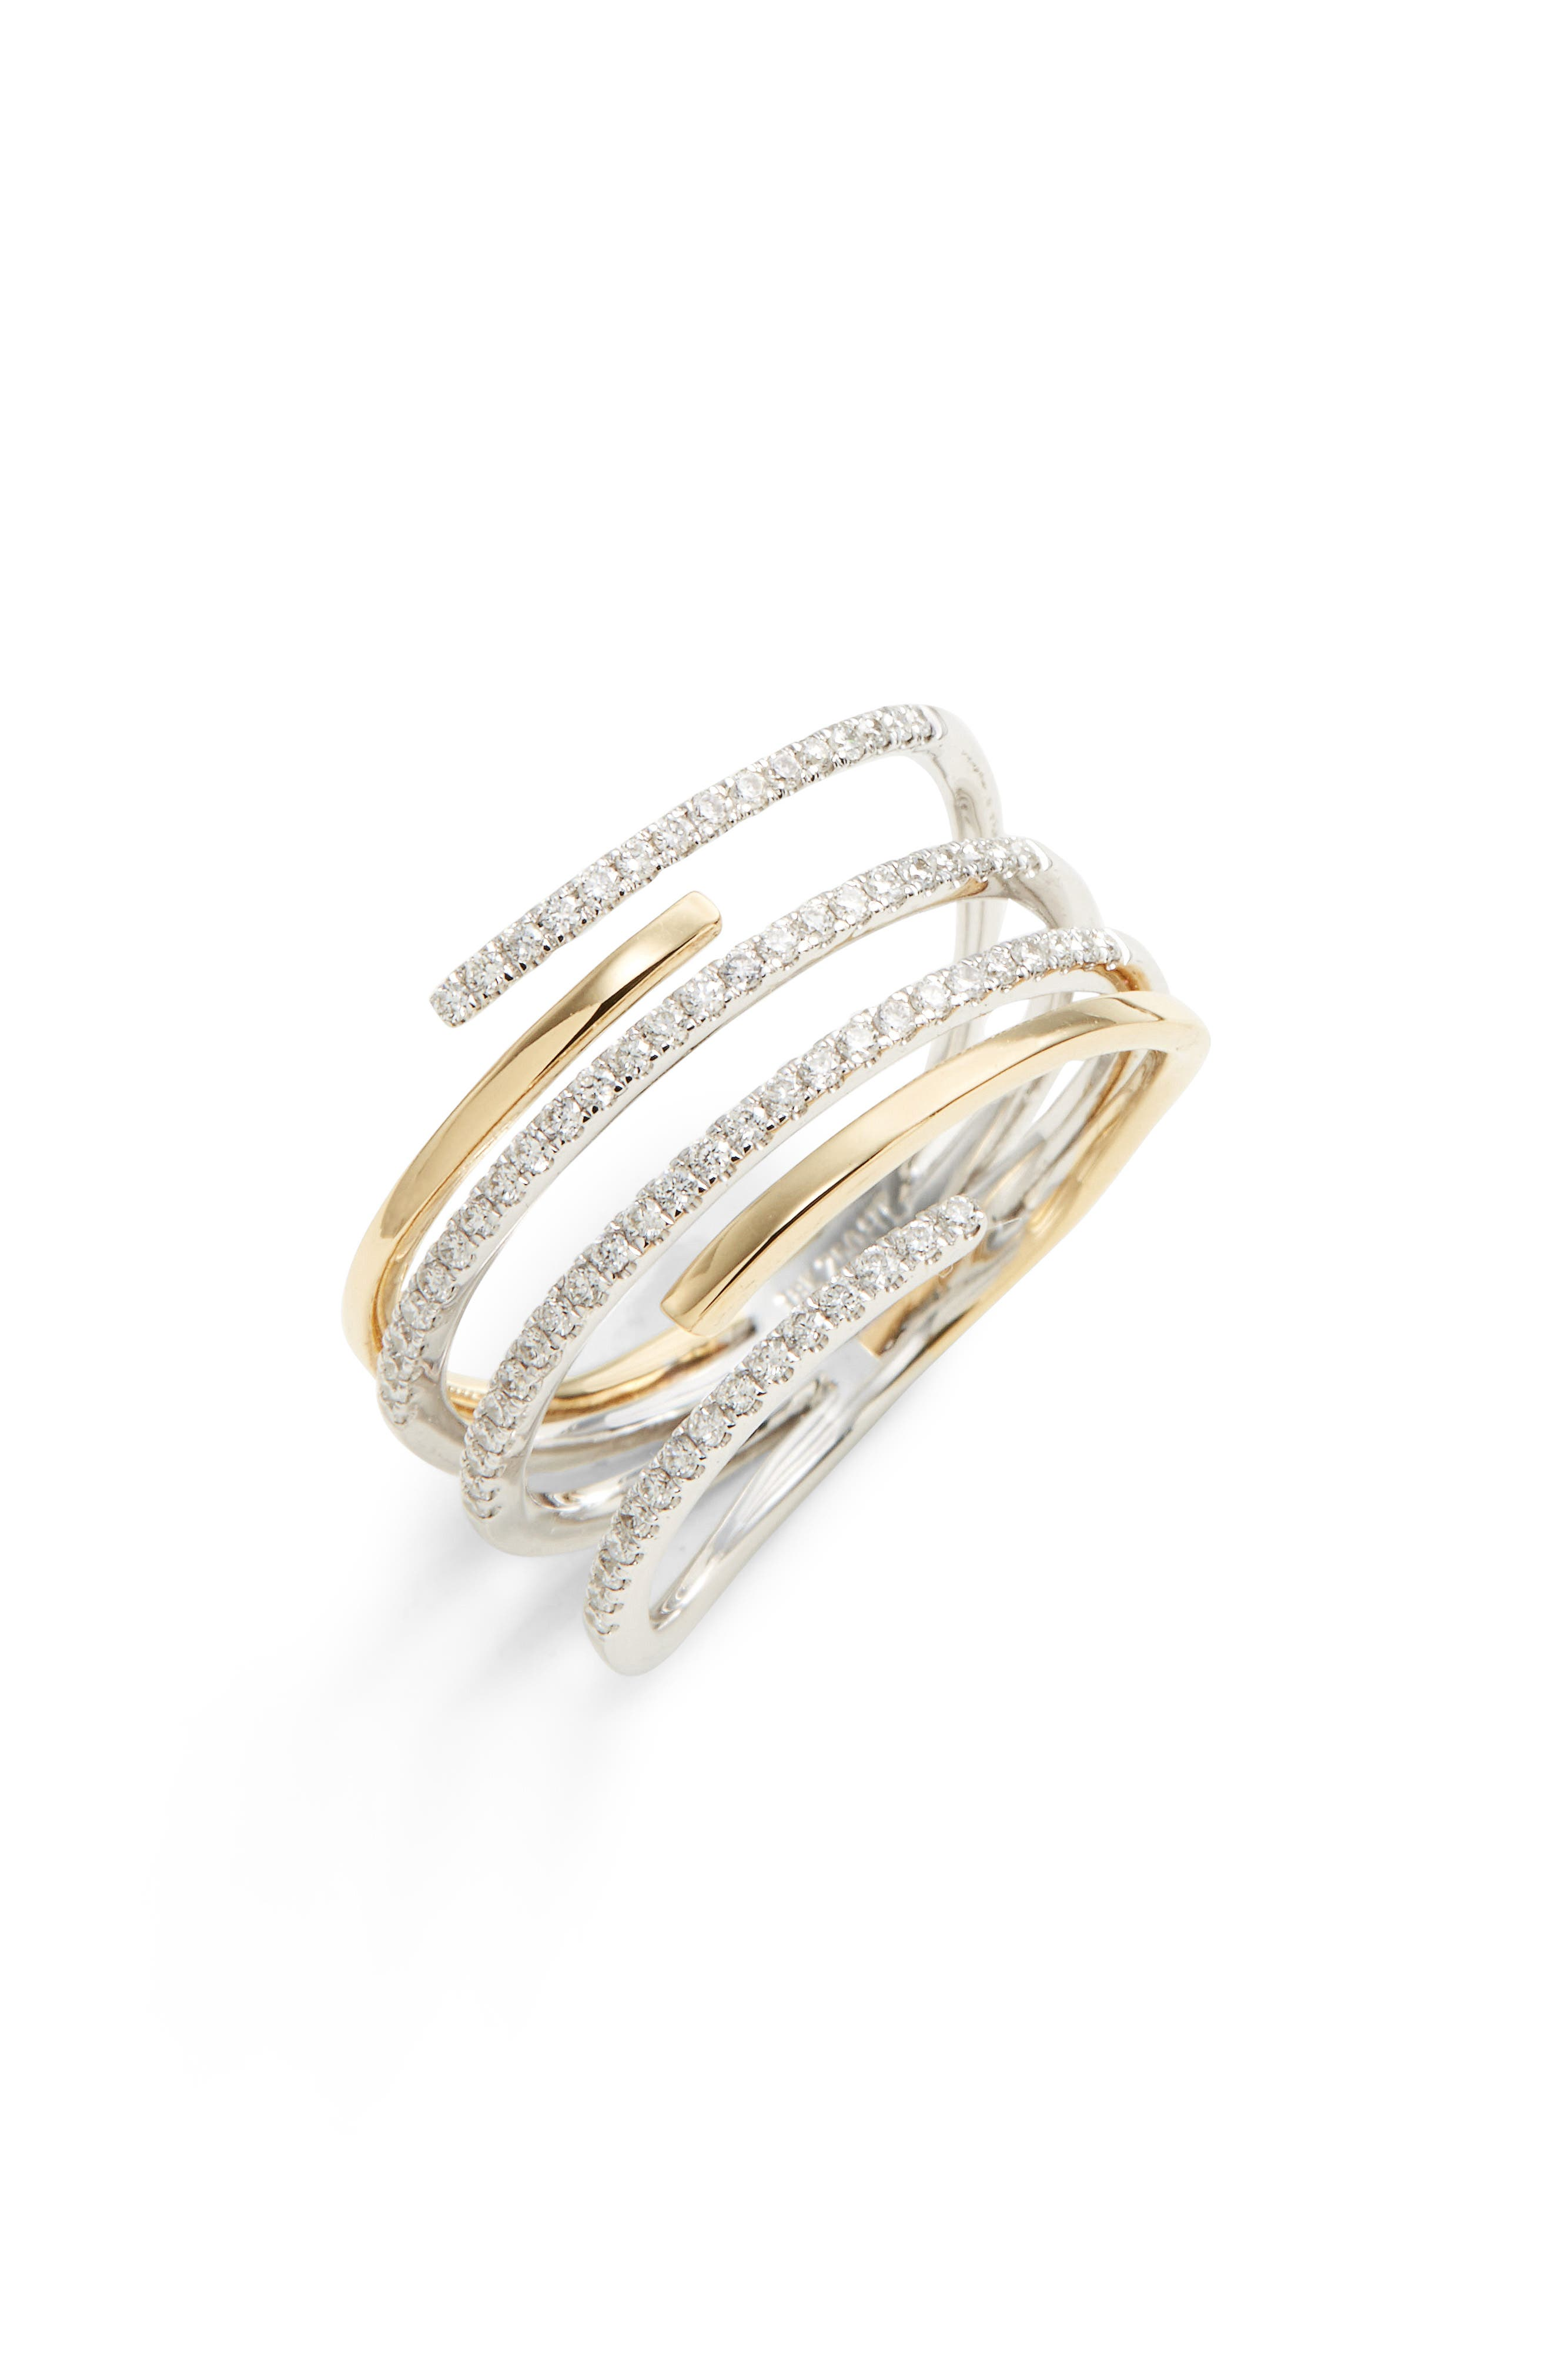 Openwork Diamond Ring,                             Main thumbnail 1, color,                             Yellow Gold/ White Gold